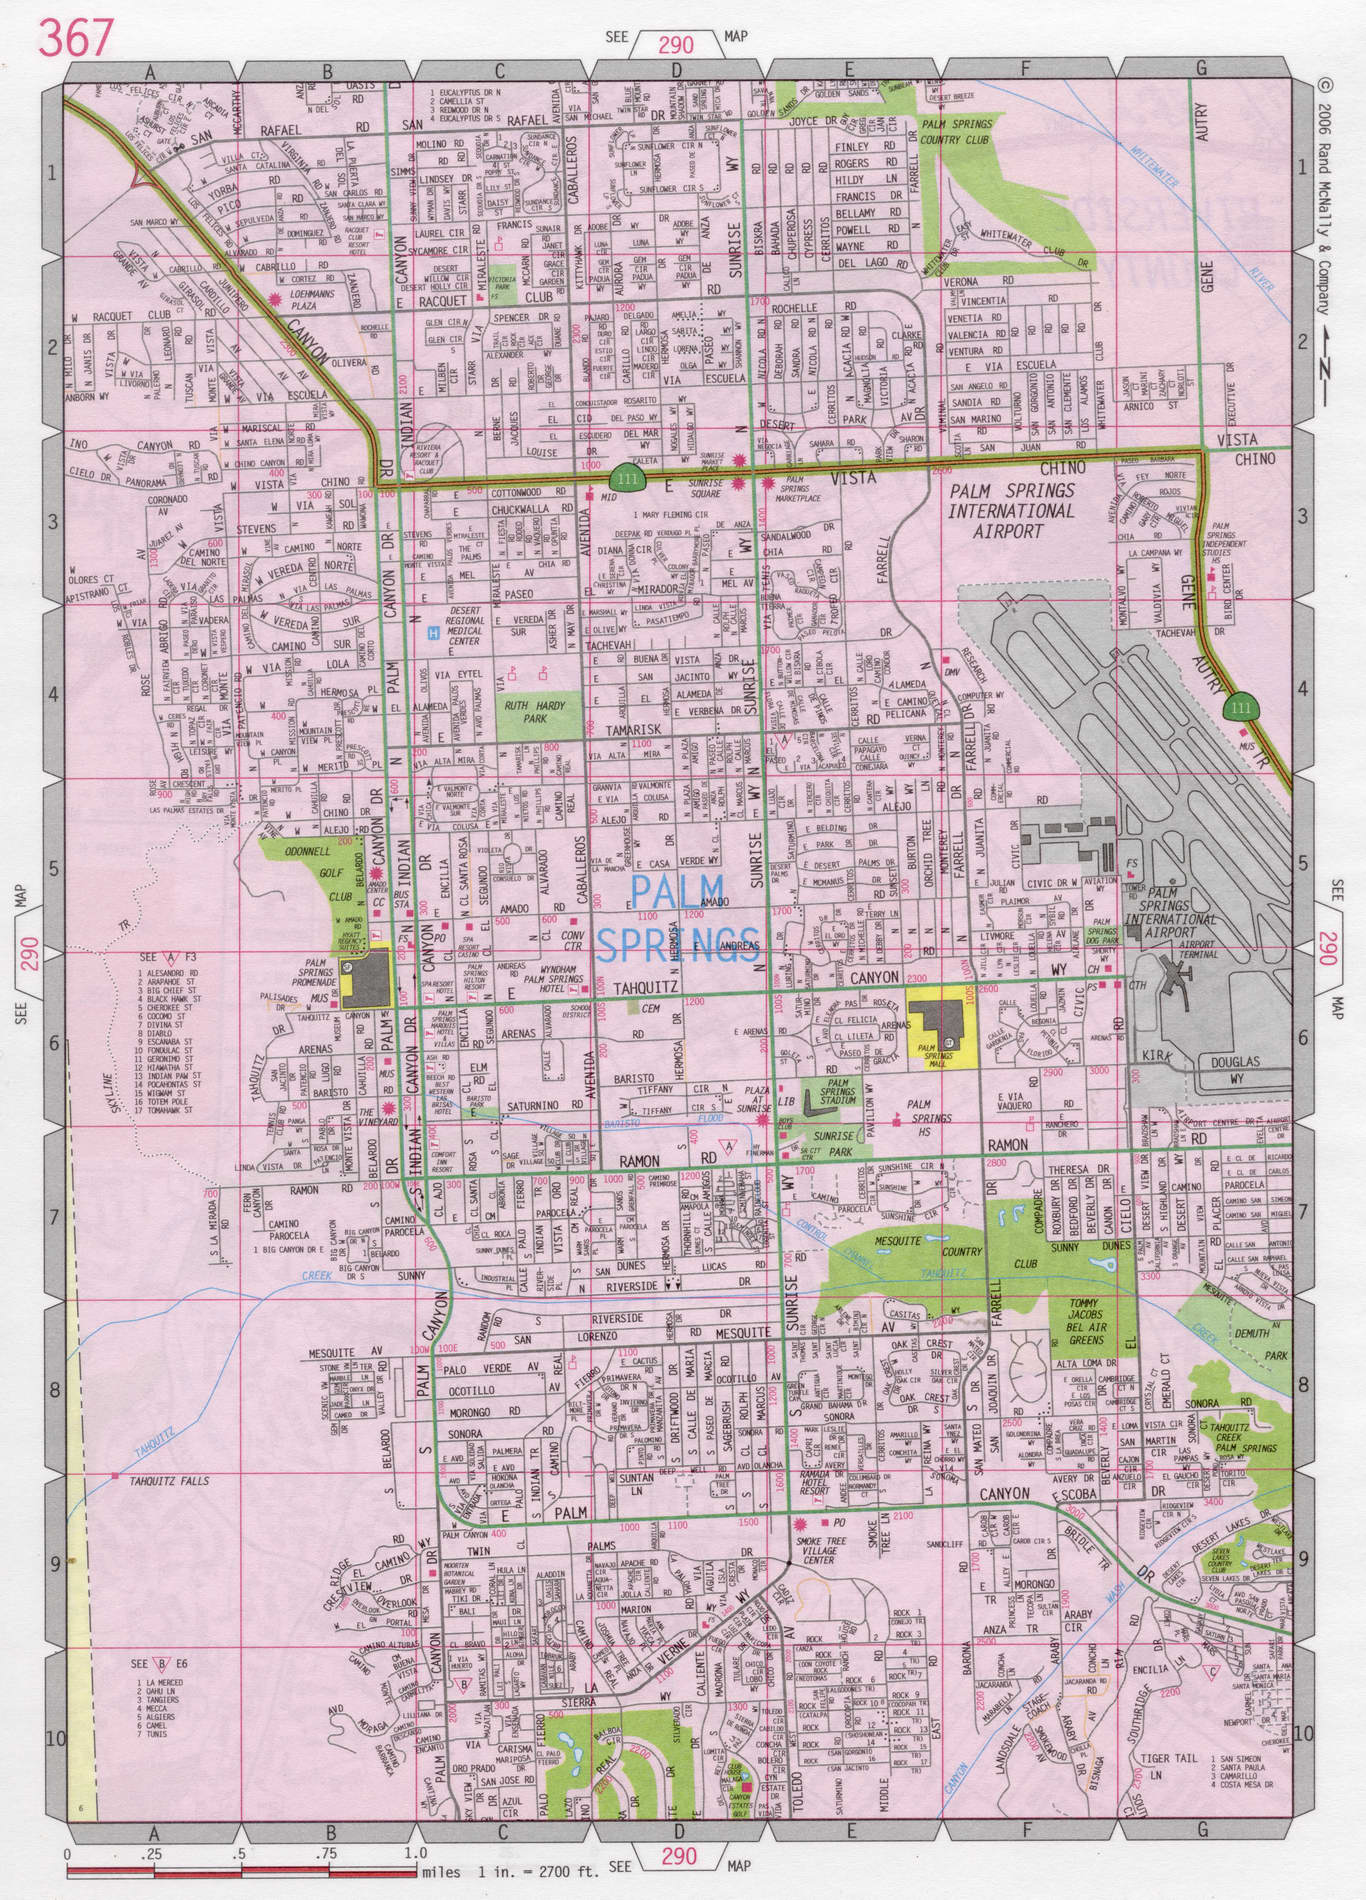 East Palo Alto Ca >> Palm Springs road map